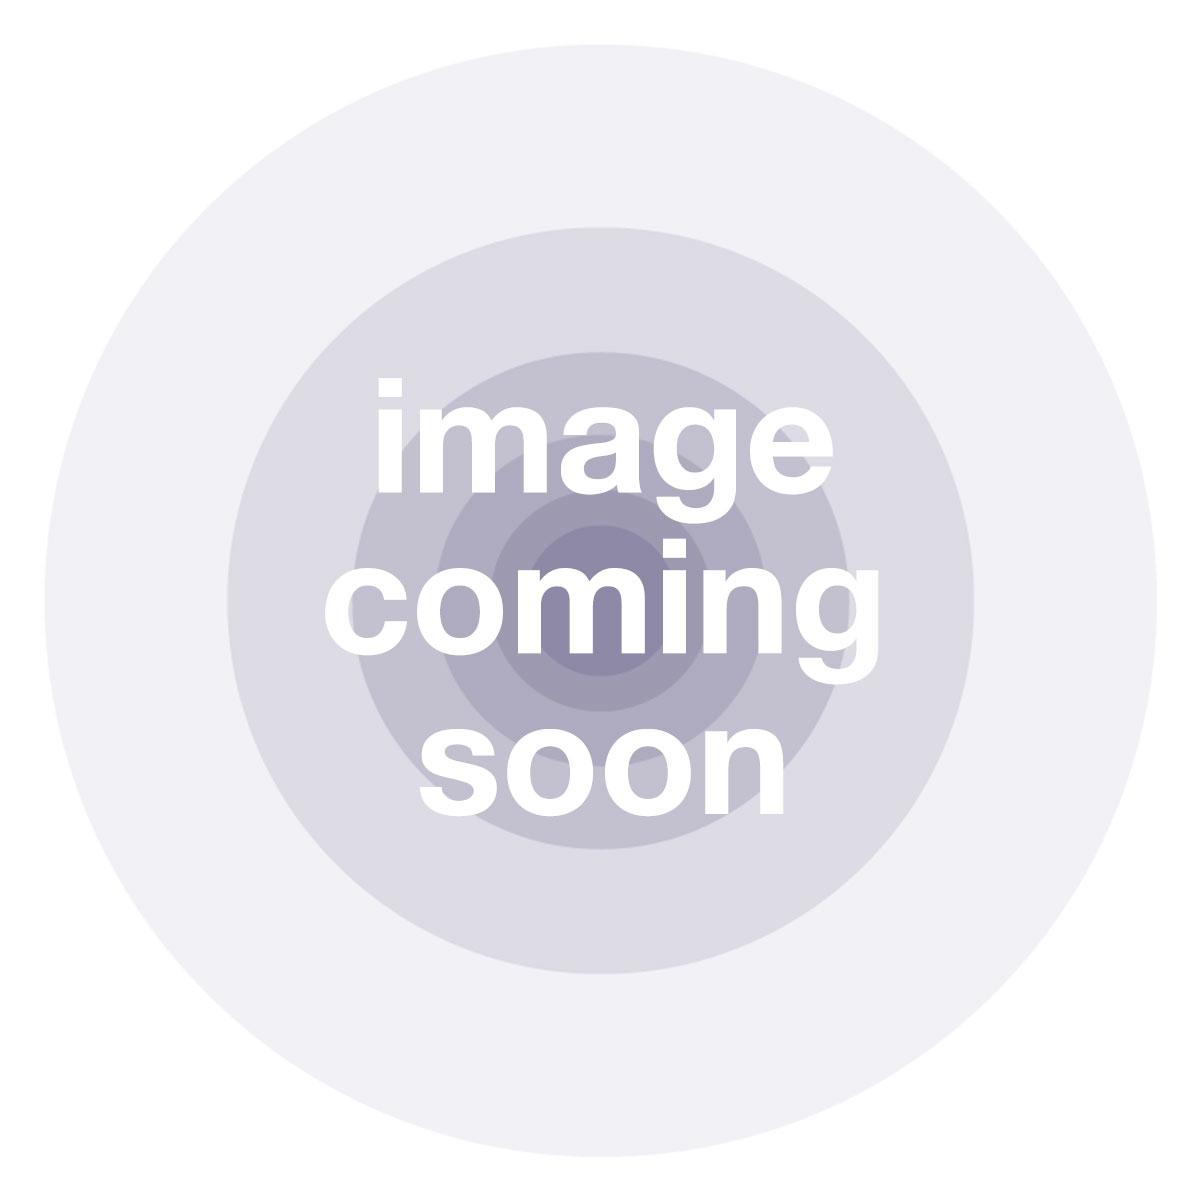 Sennheiser ClipMic Digital iOS Device Microphone